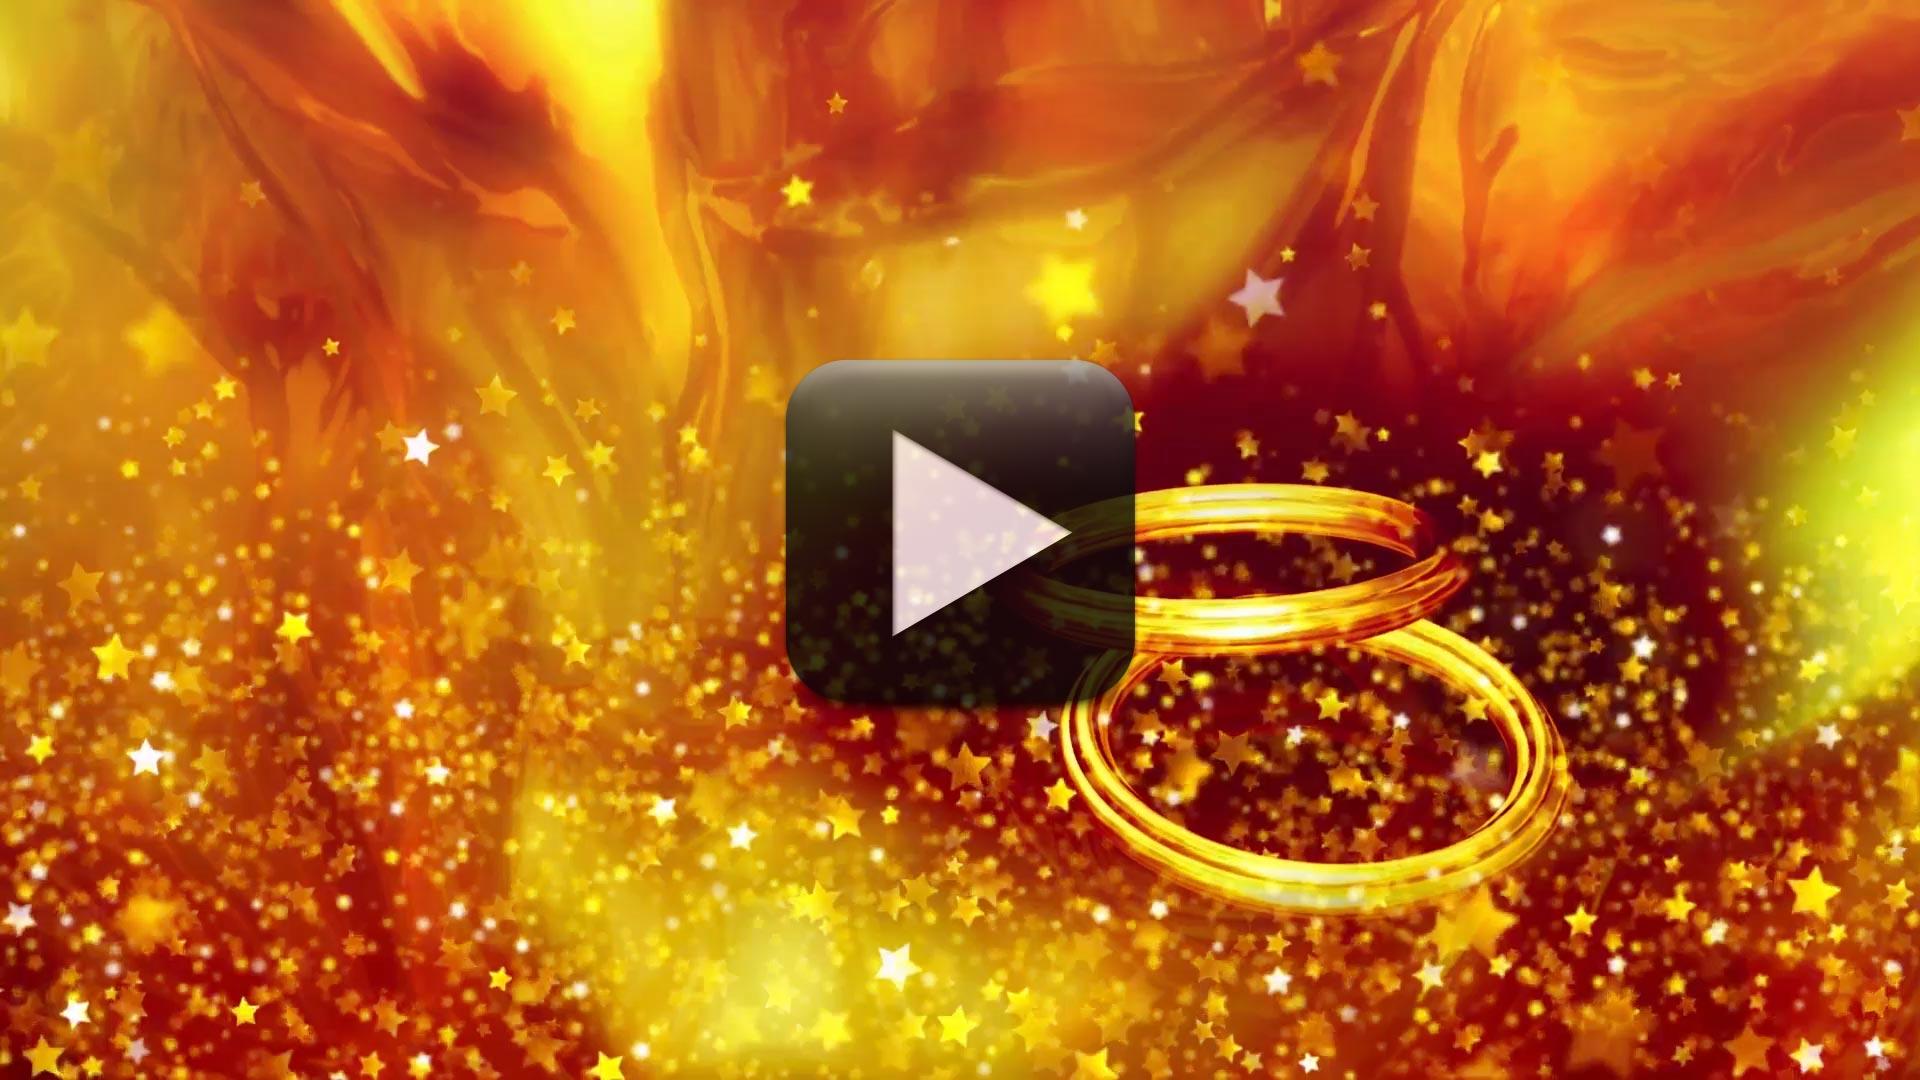 Wedding Rings Video Background